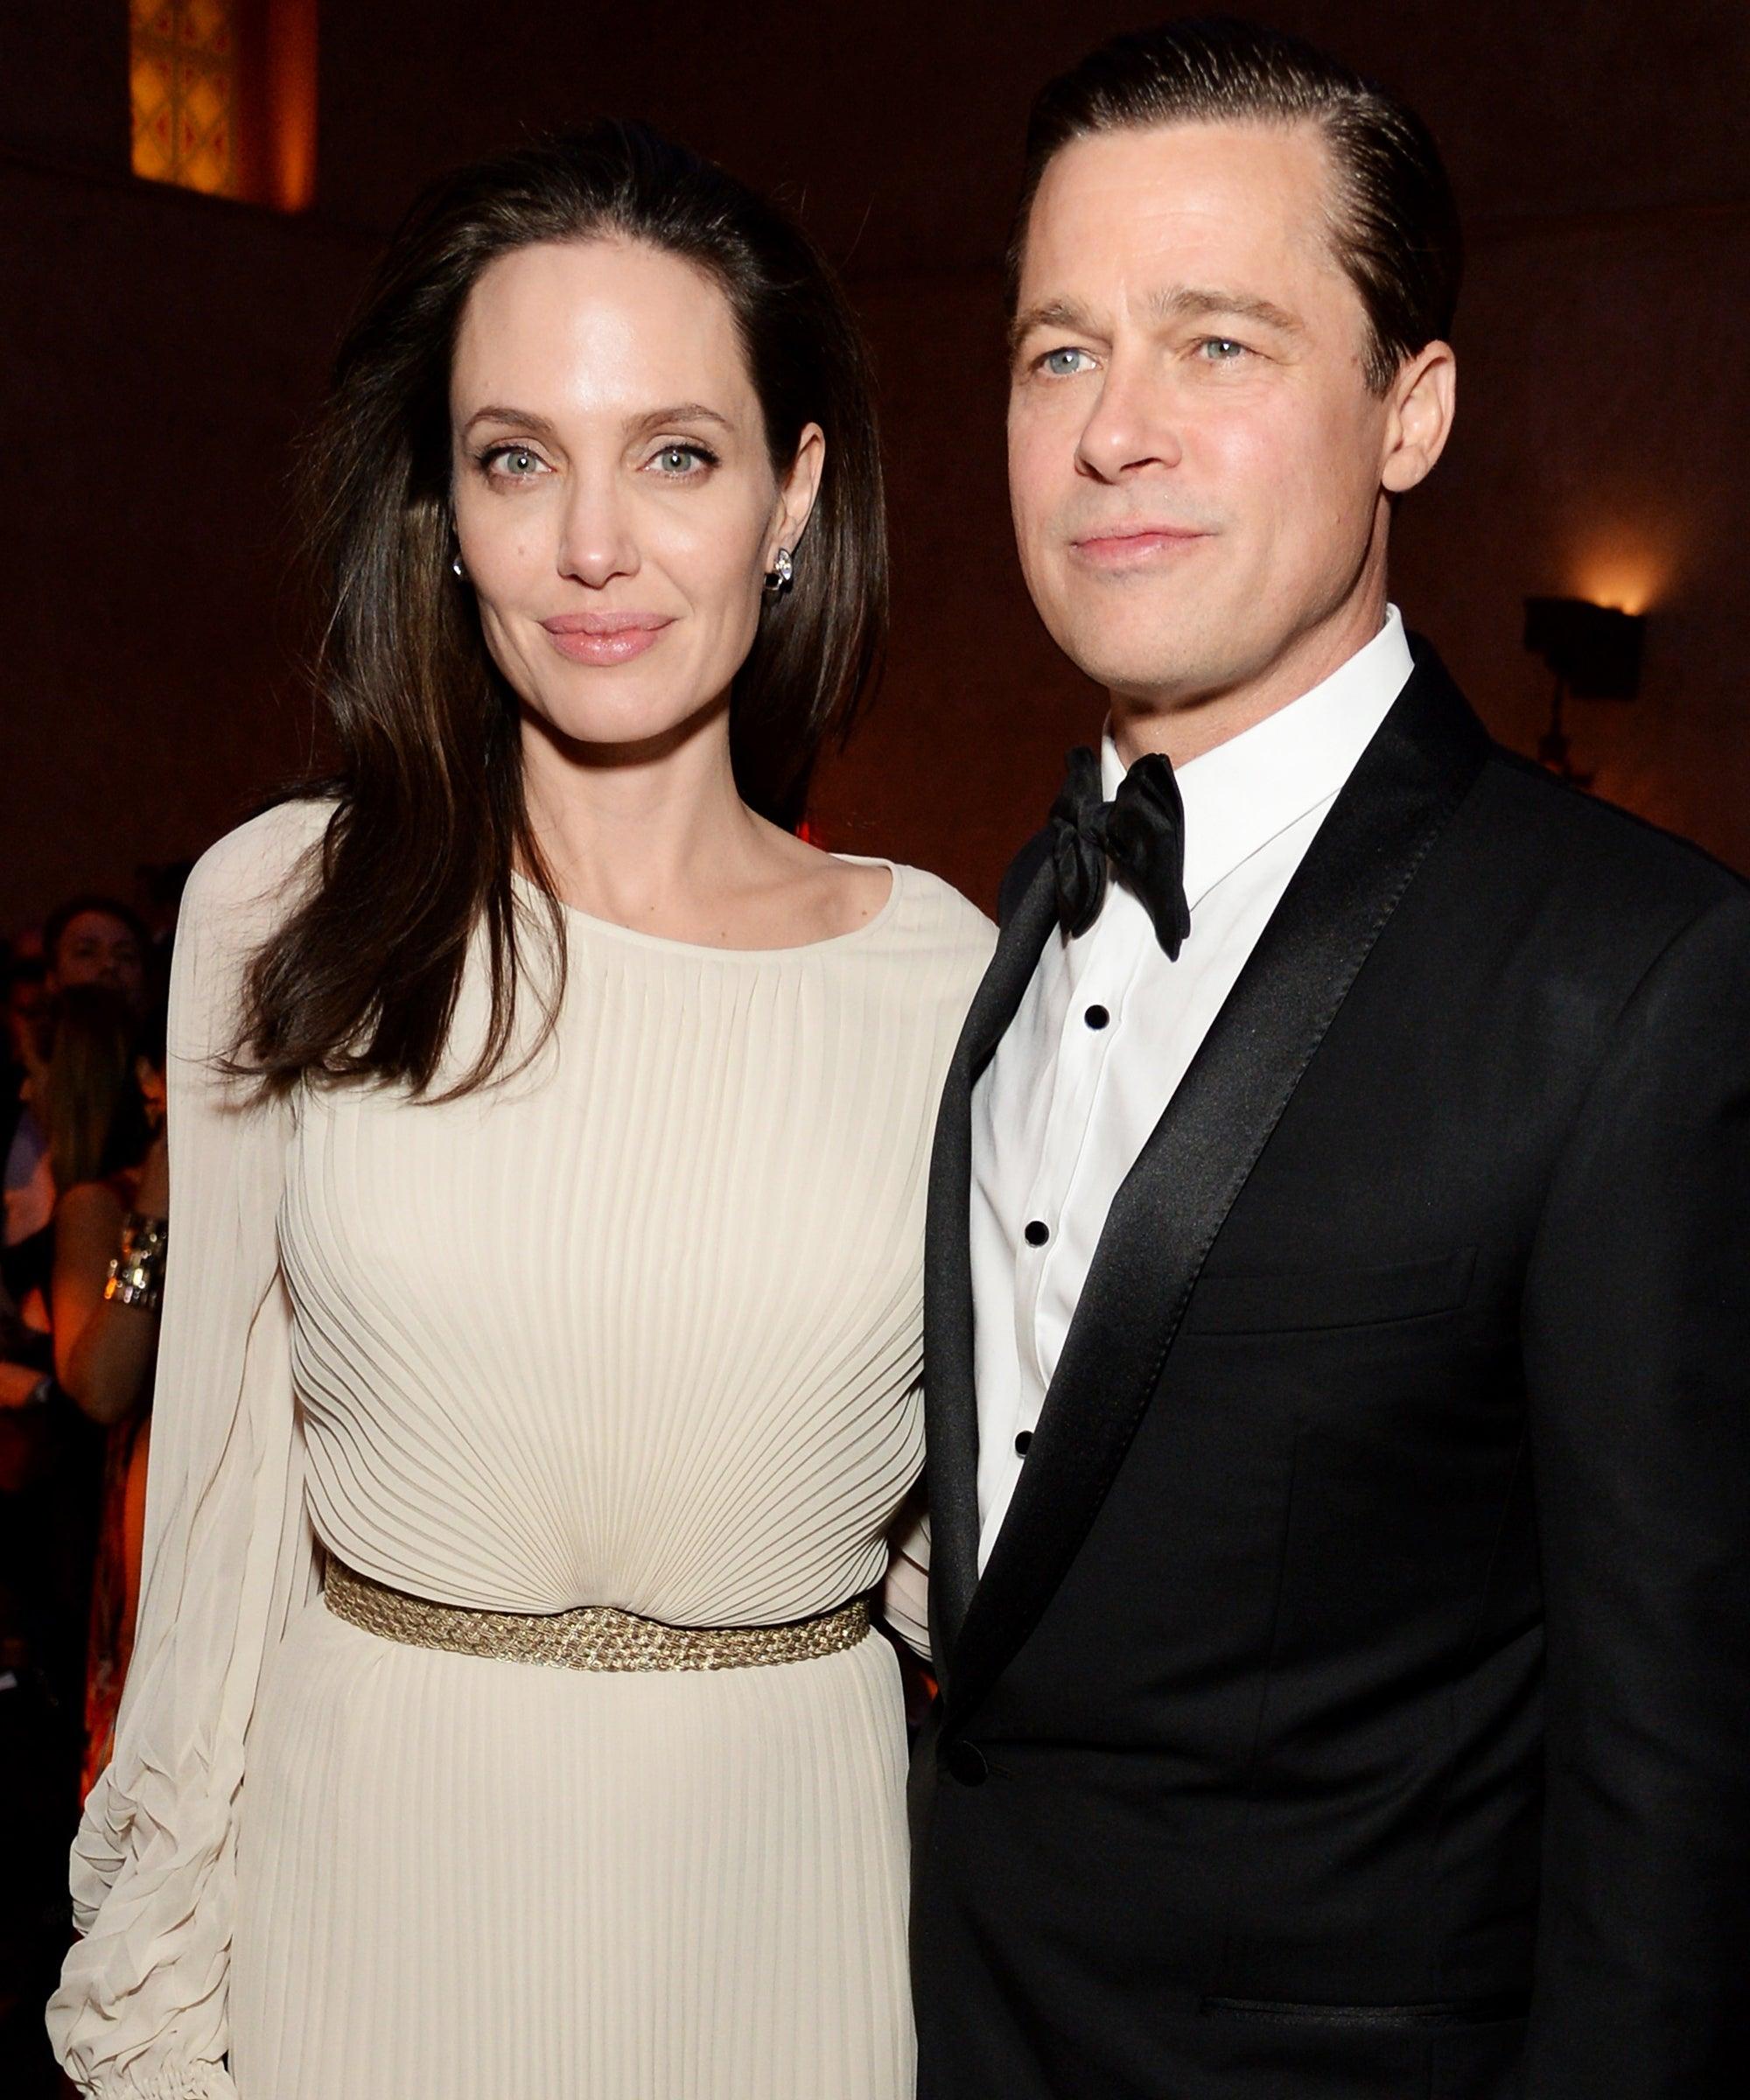 Angelina Jolie Gave A Frank Update On Her & Brad Pitt's Relationship